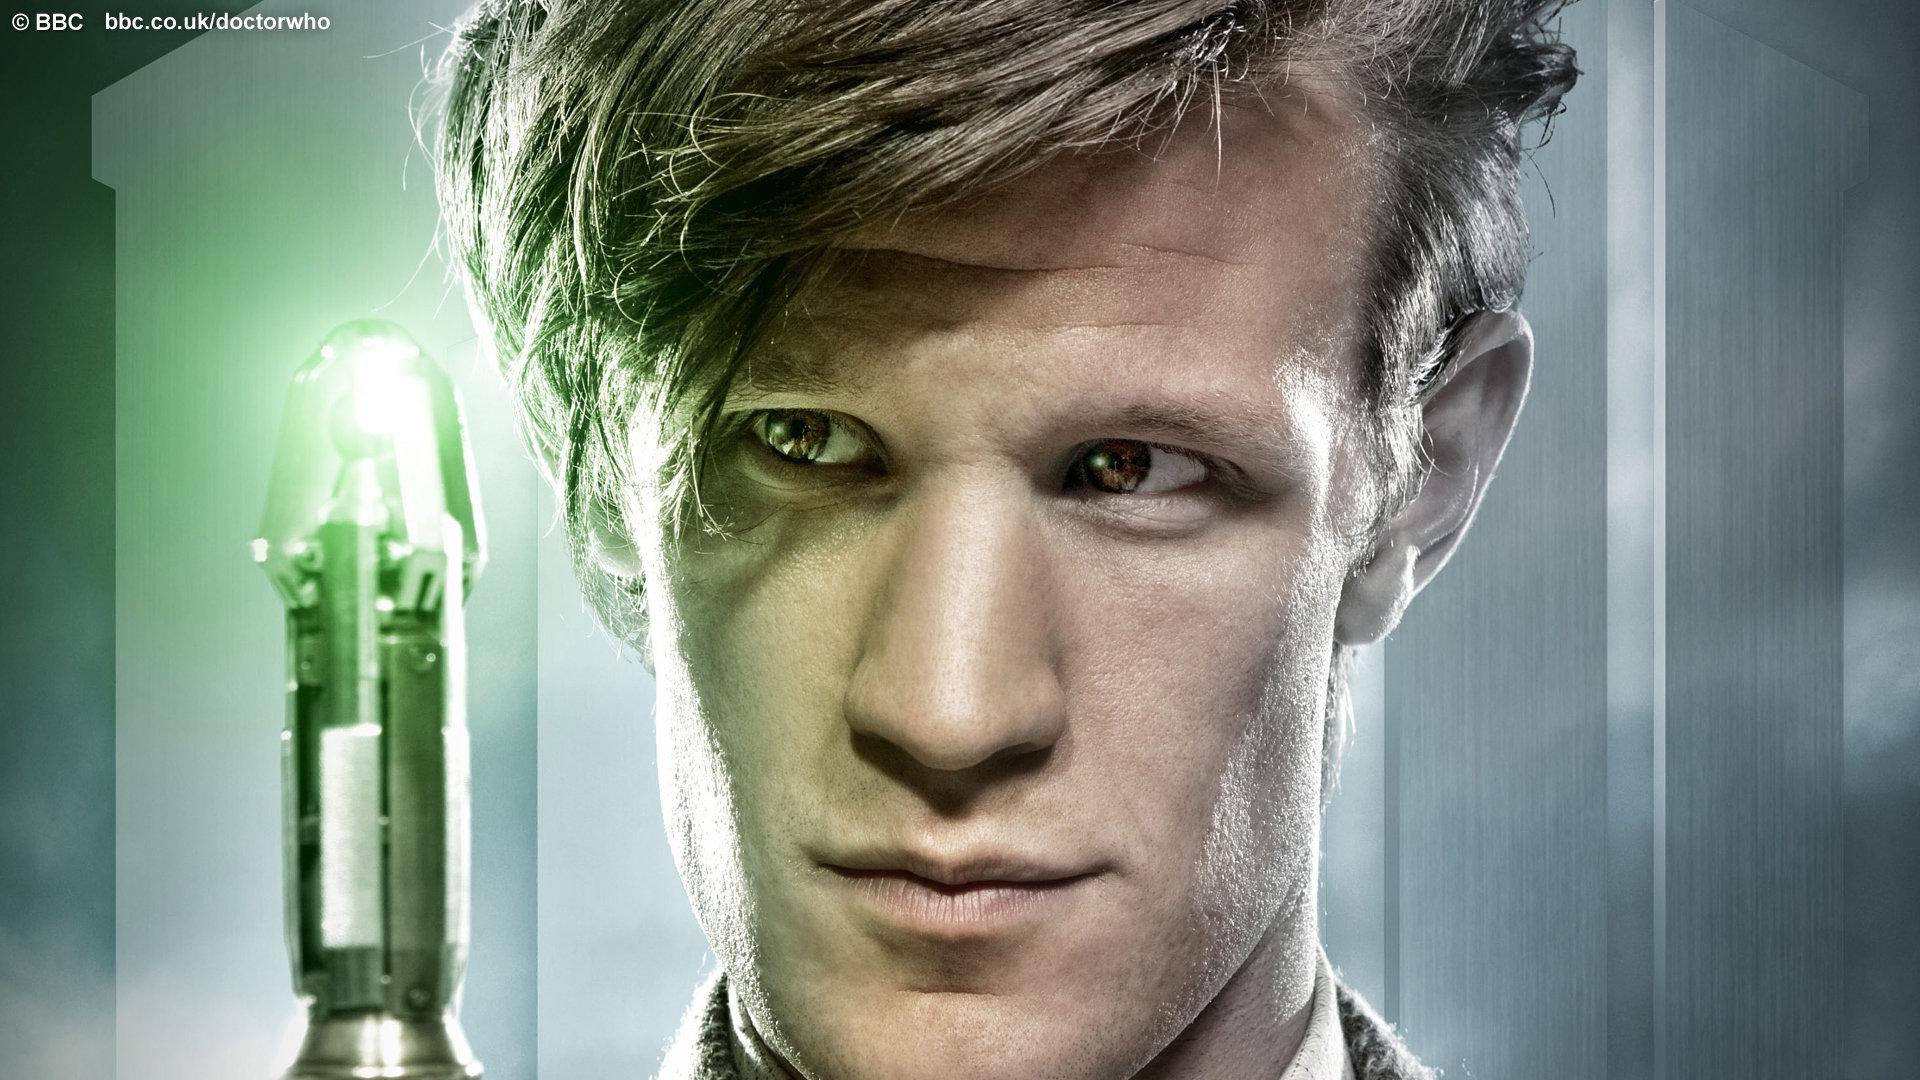 Doctor Who Matt Smith Wallpaper 1920x1080